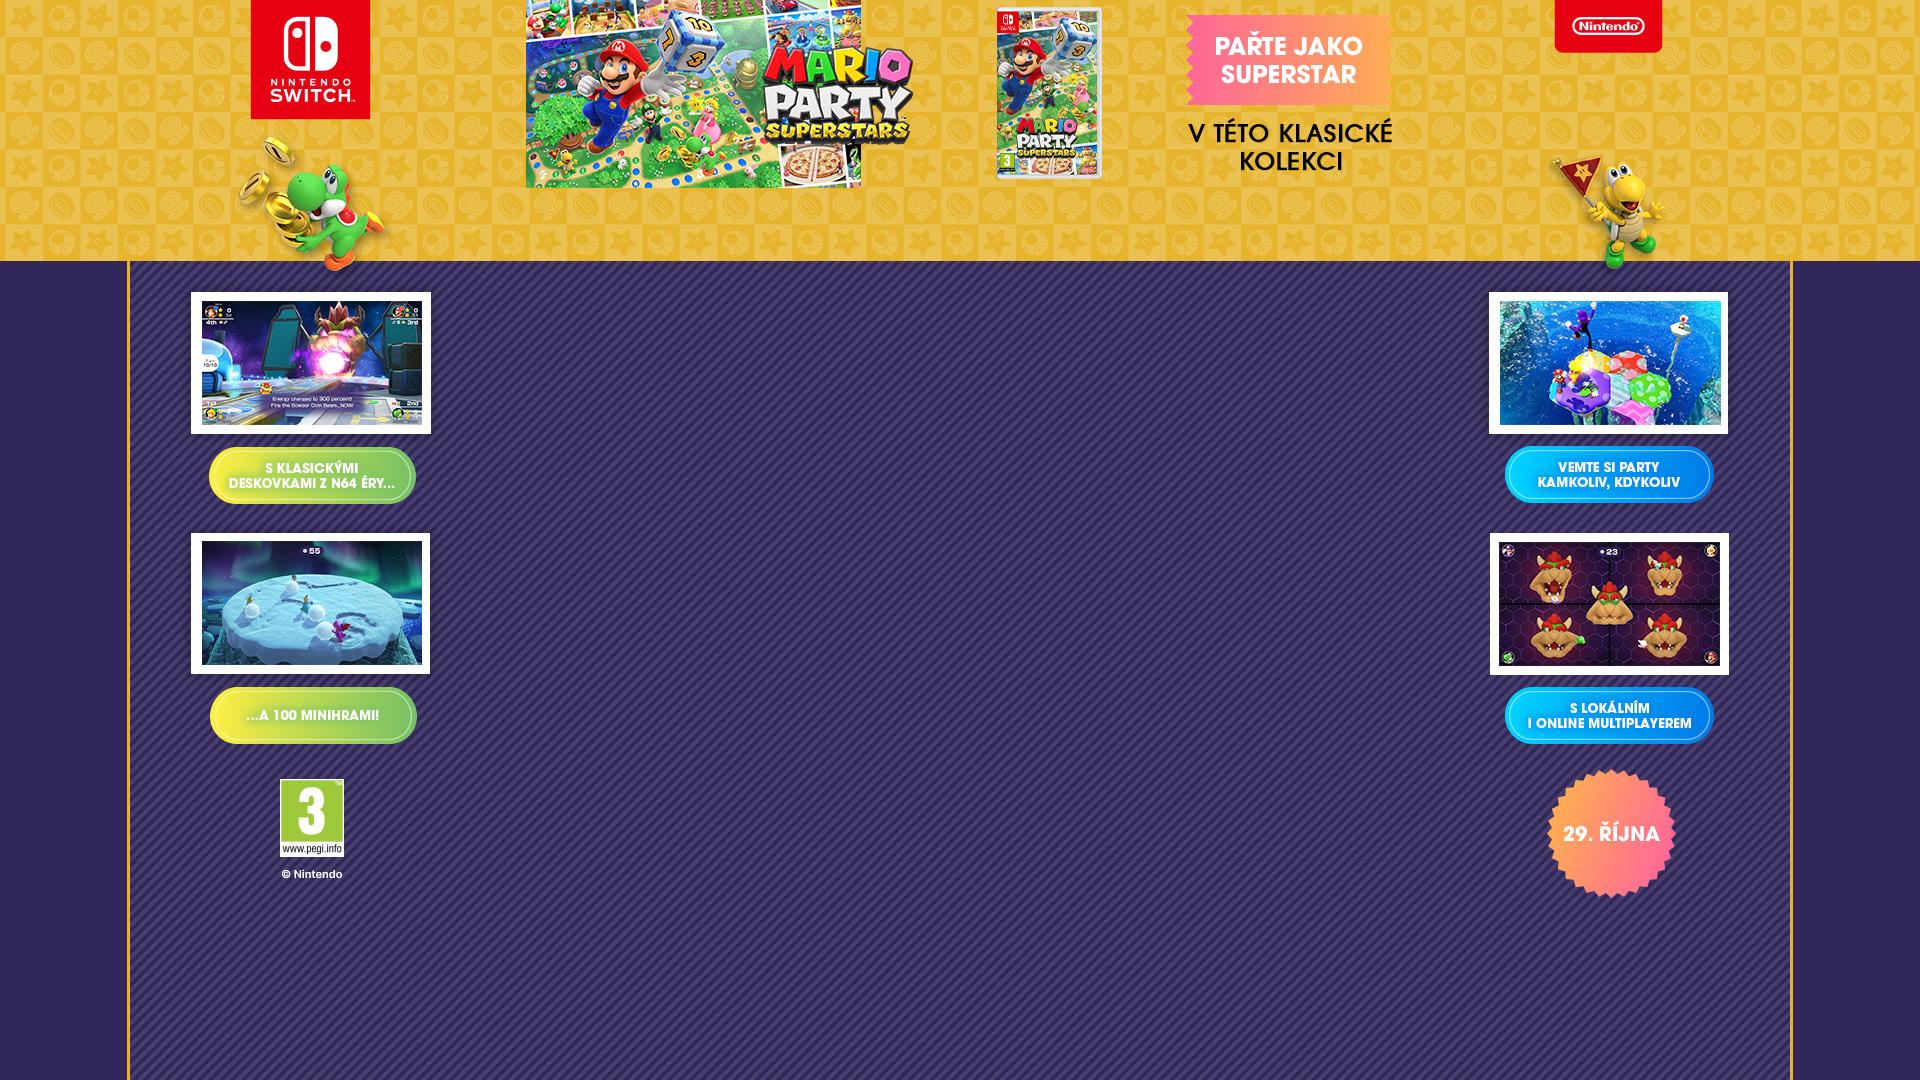 NINTENDOSHOP SWITCH Mario Party Superstars